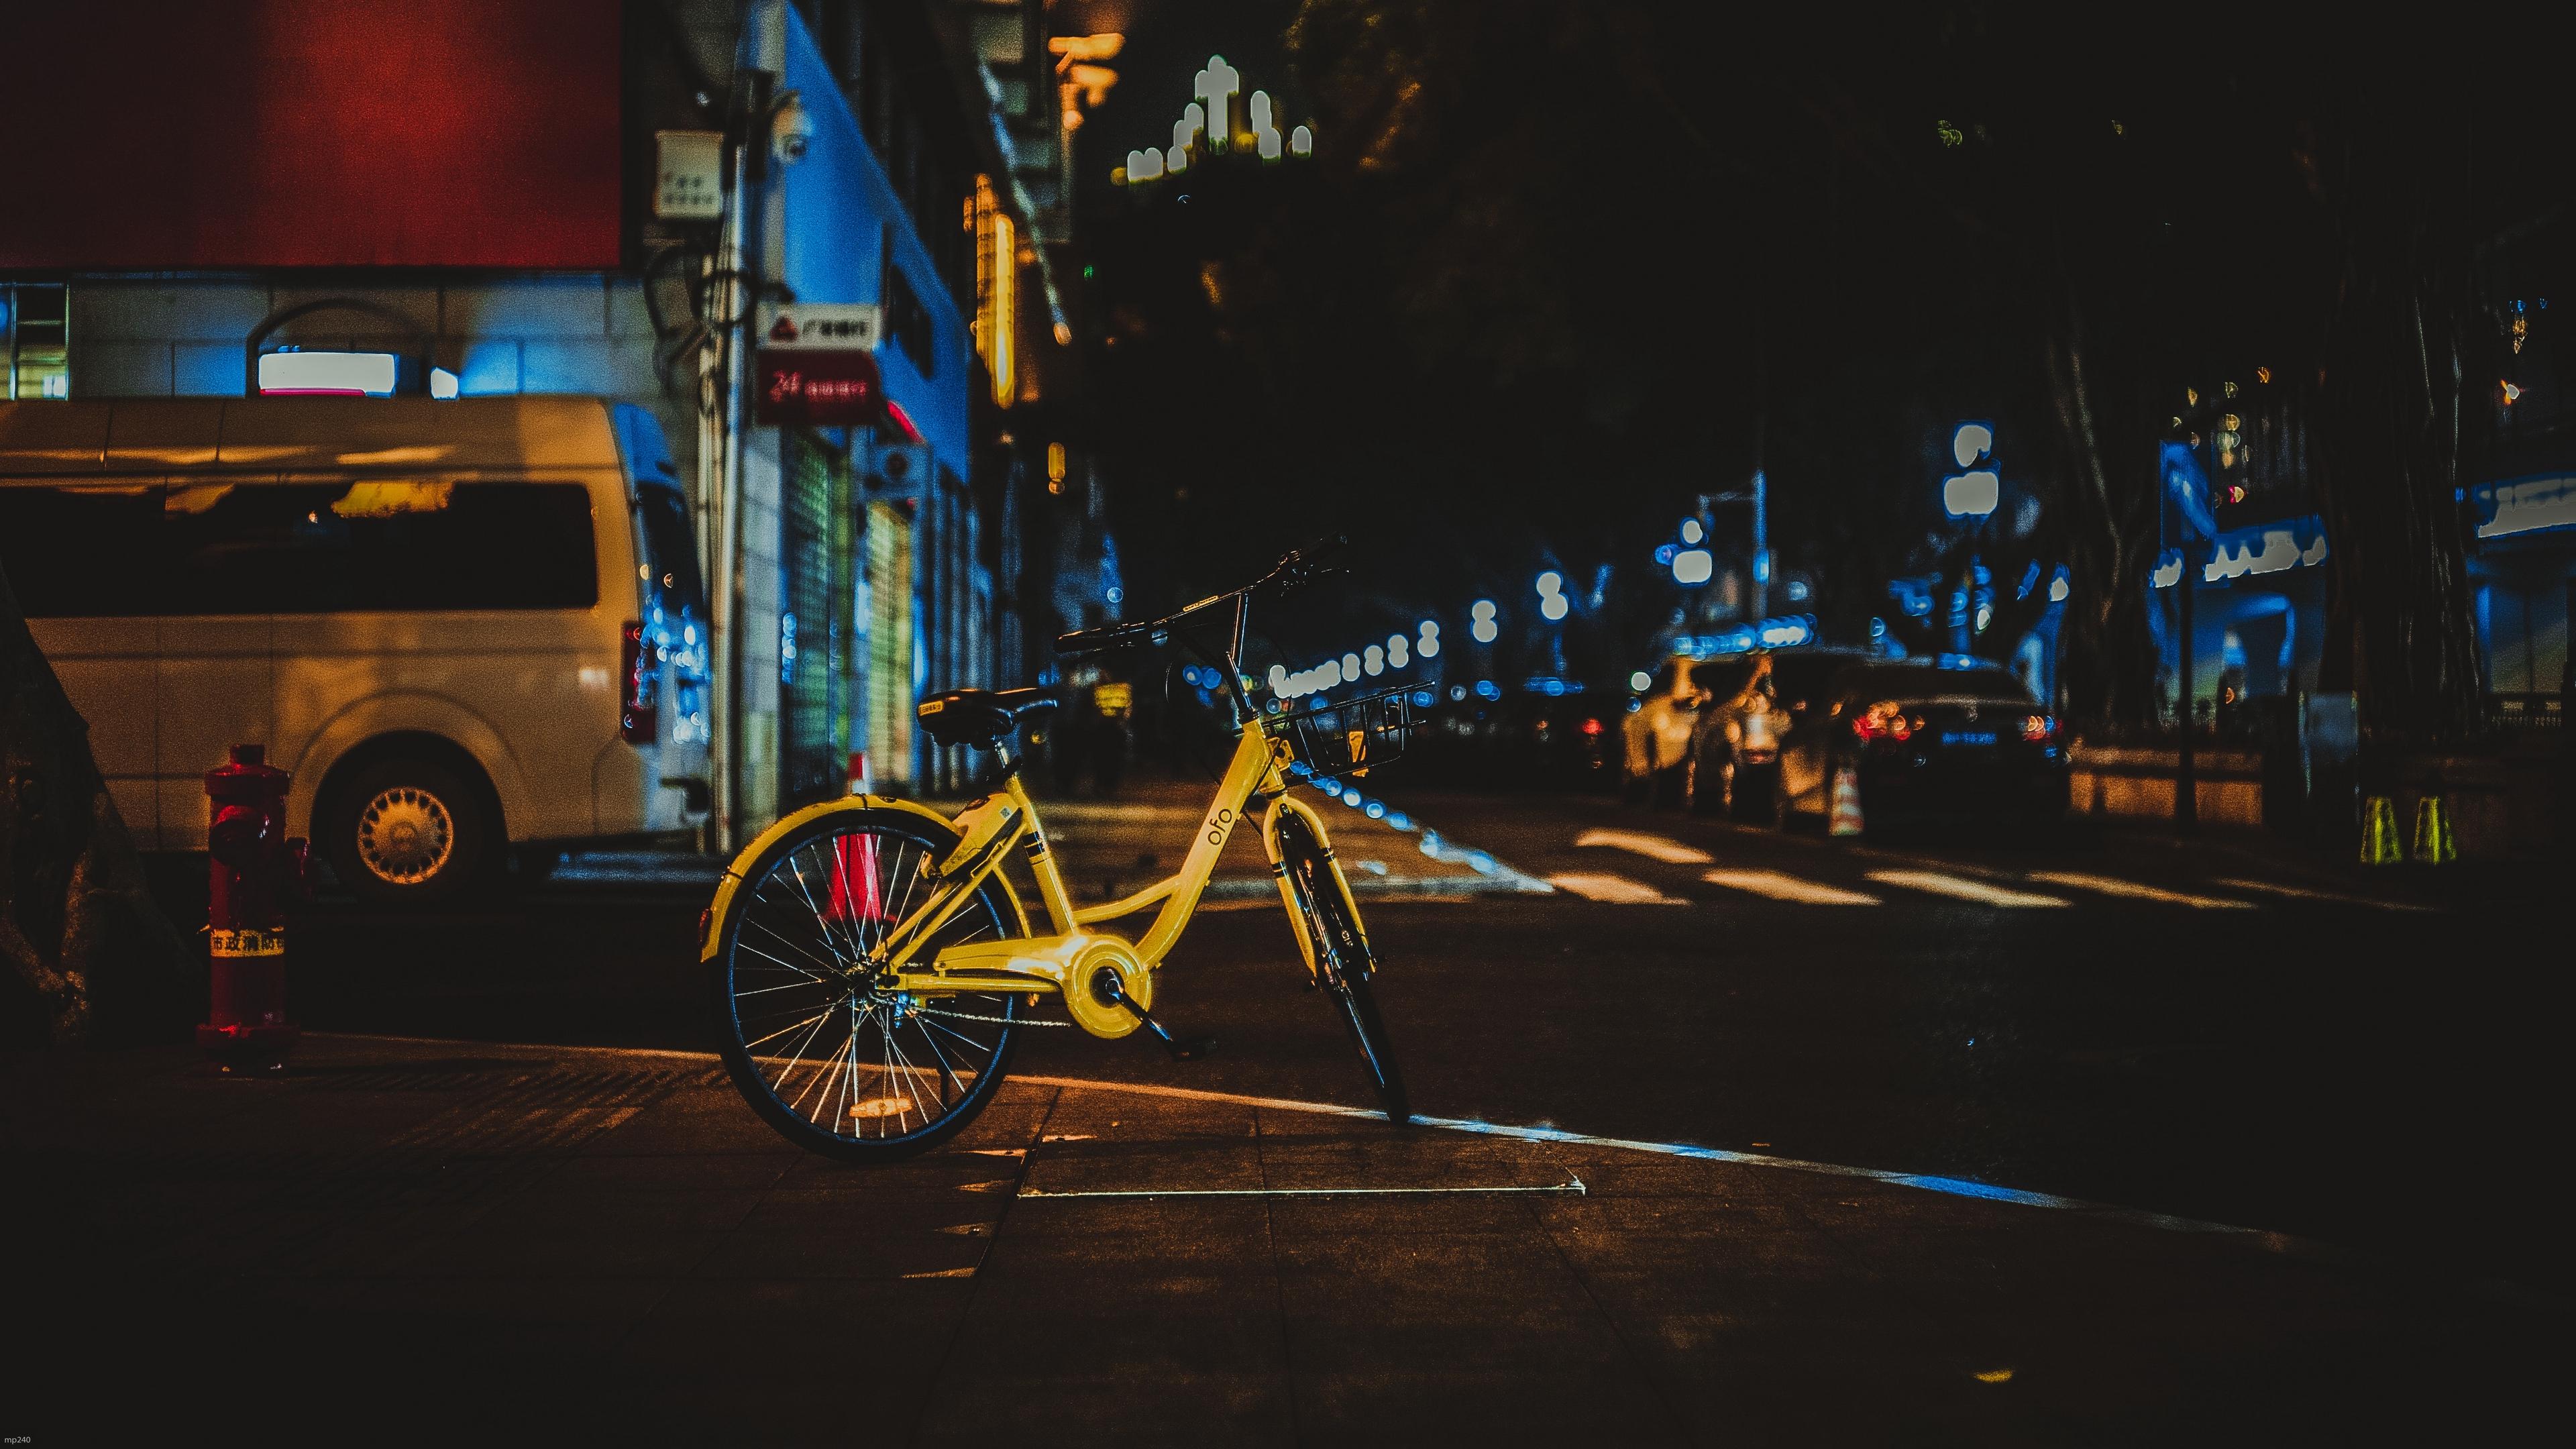 bicycle street city evening 4k 1538068132 - bicycle, street, city, evening 4k - Street, City, Bicycle